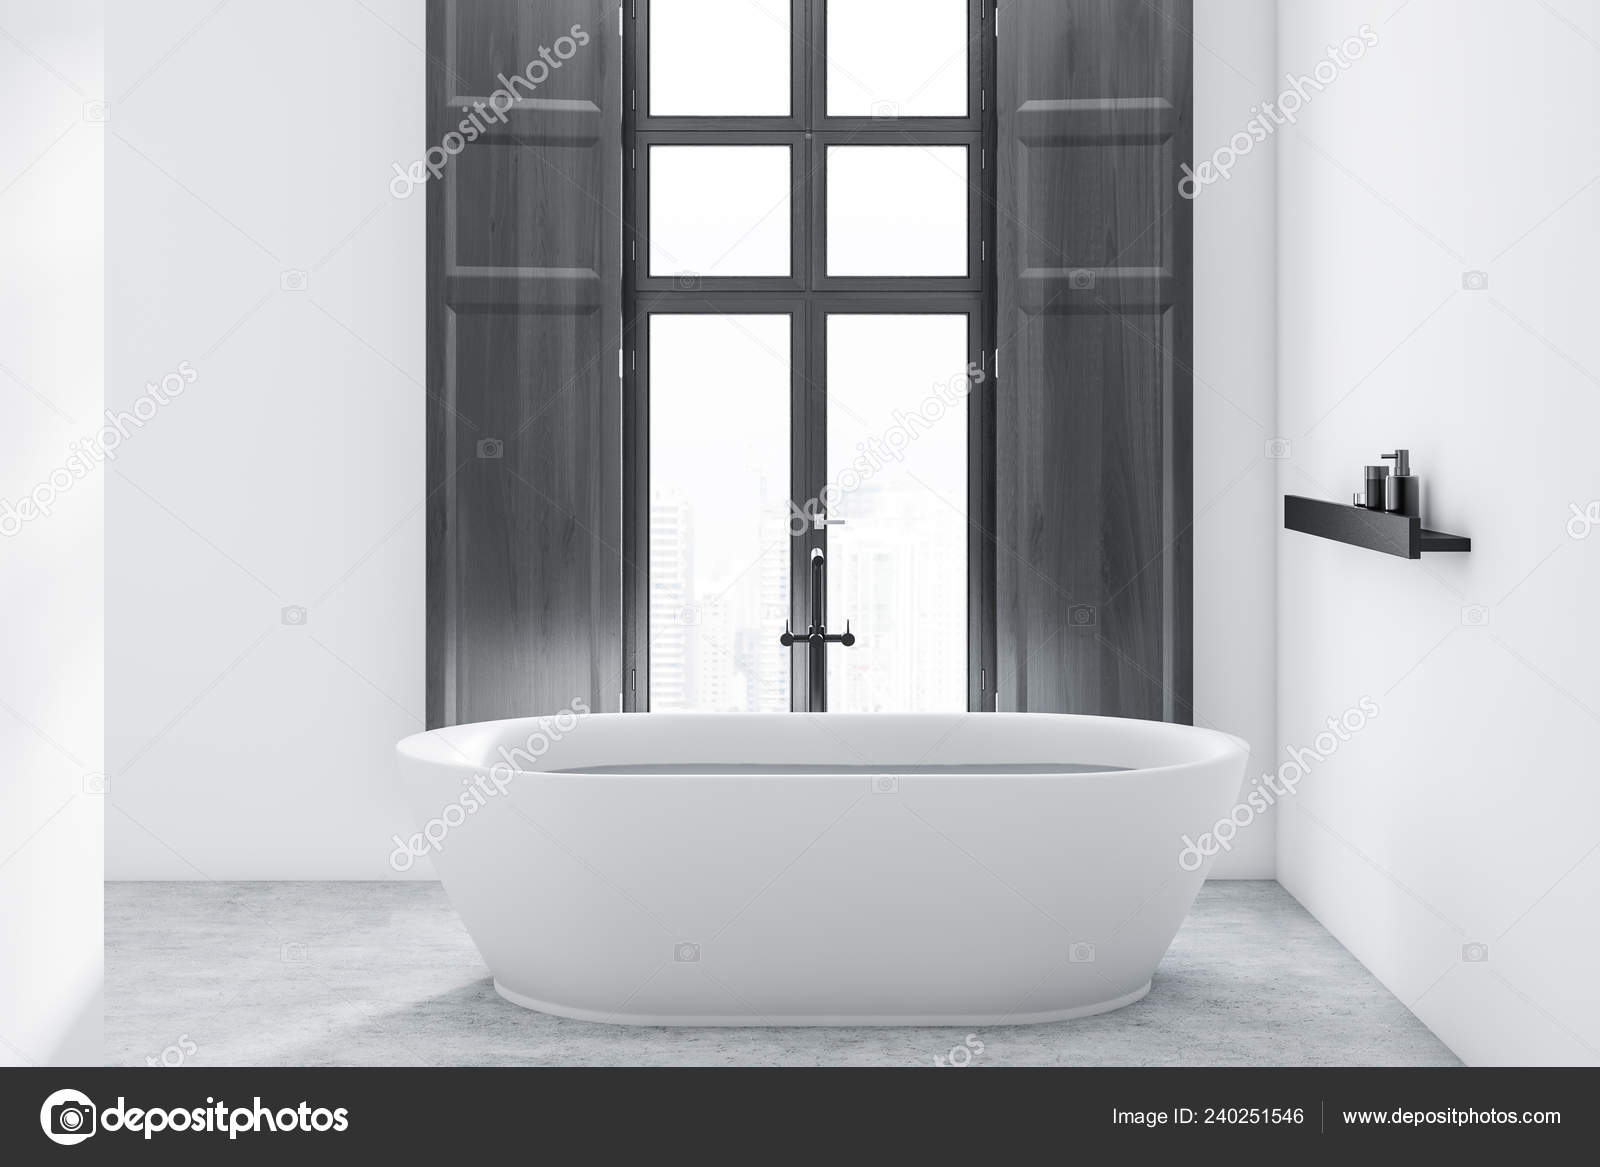 Interior Minimalistic Bathroom White Walls Concrete Floor